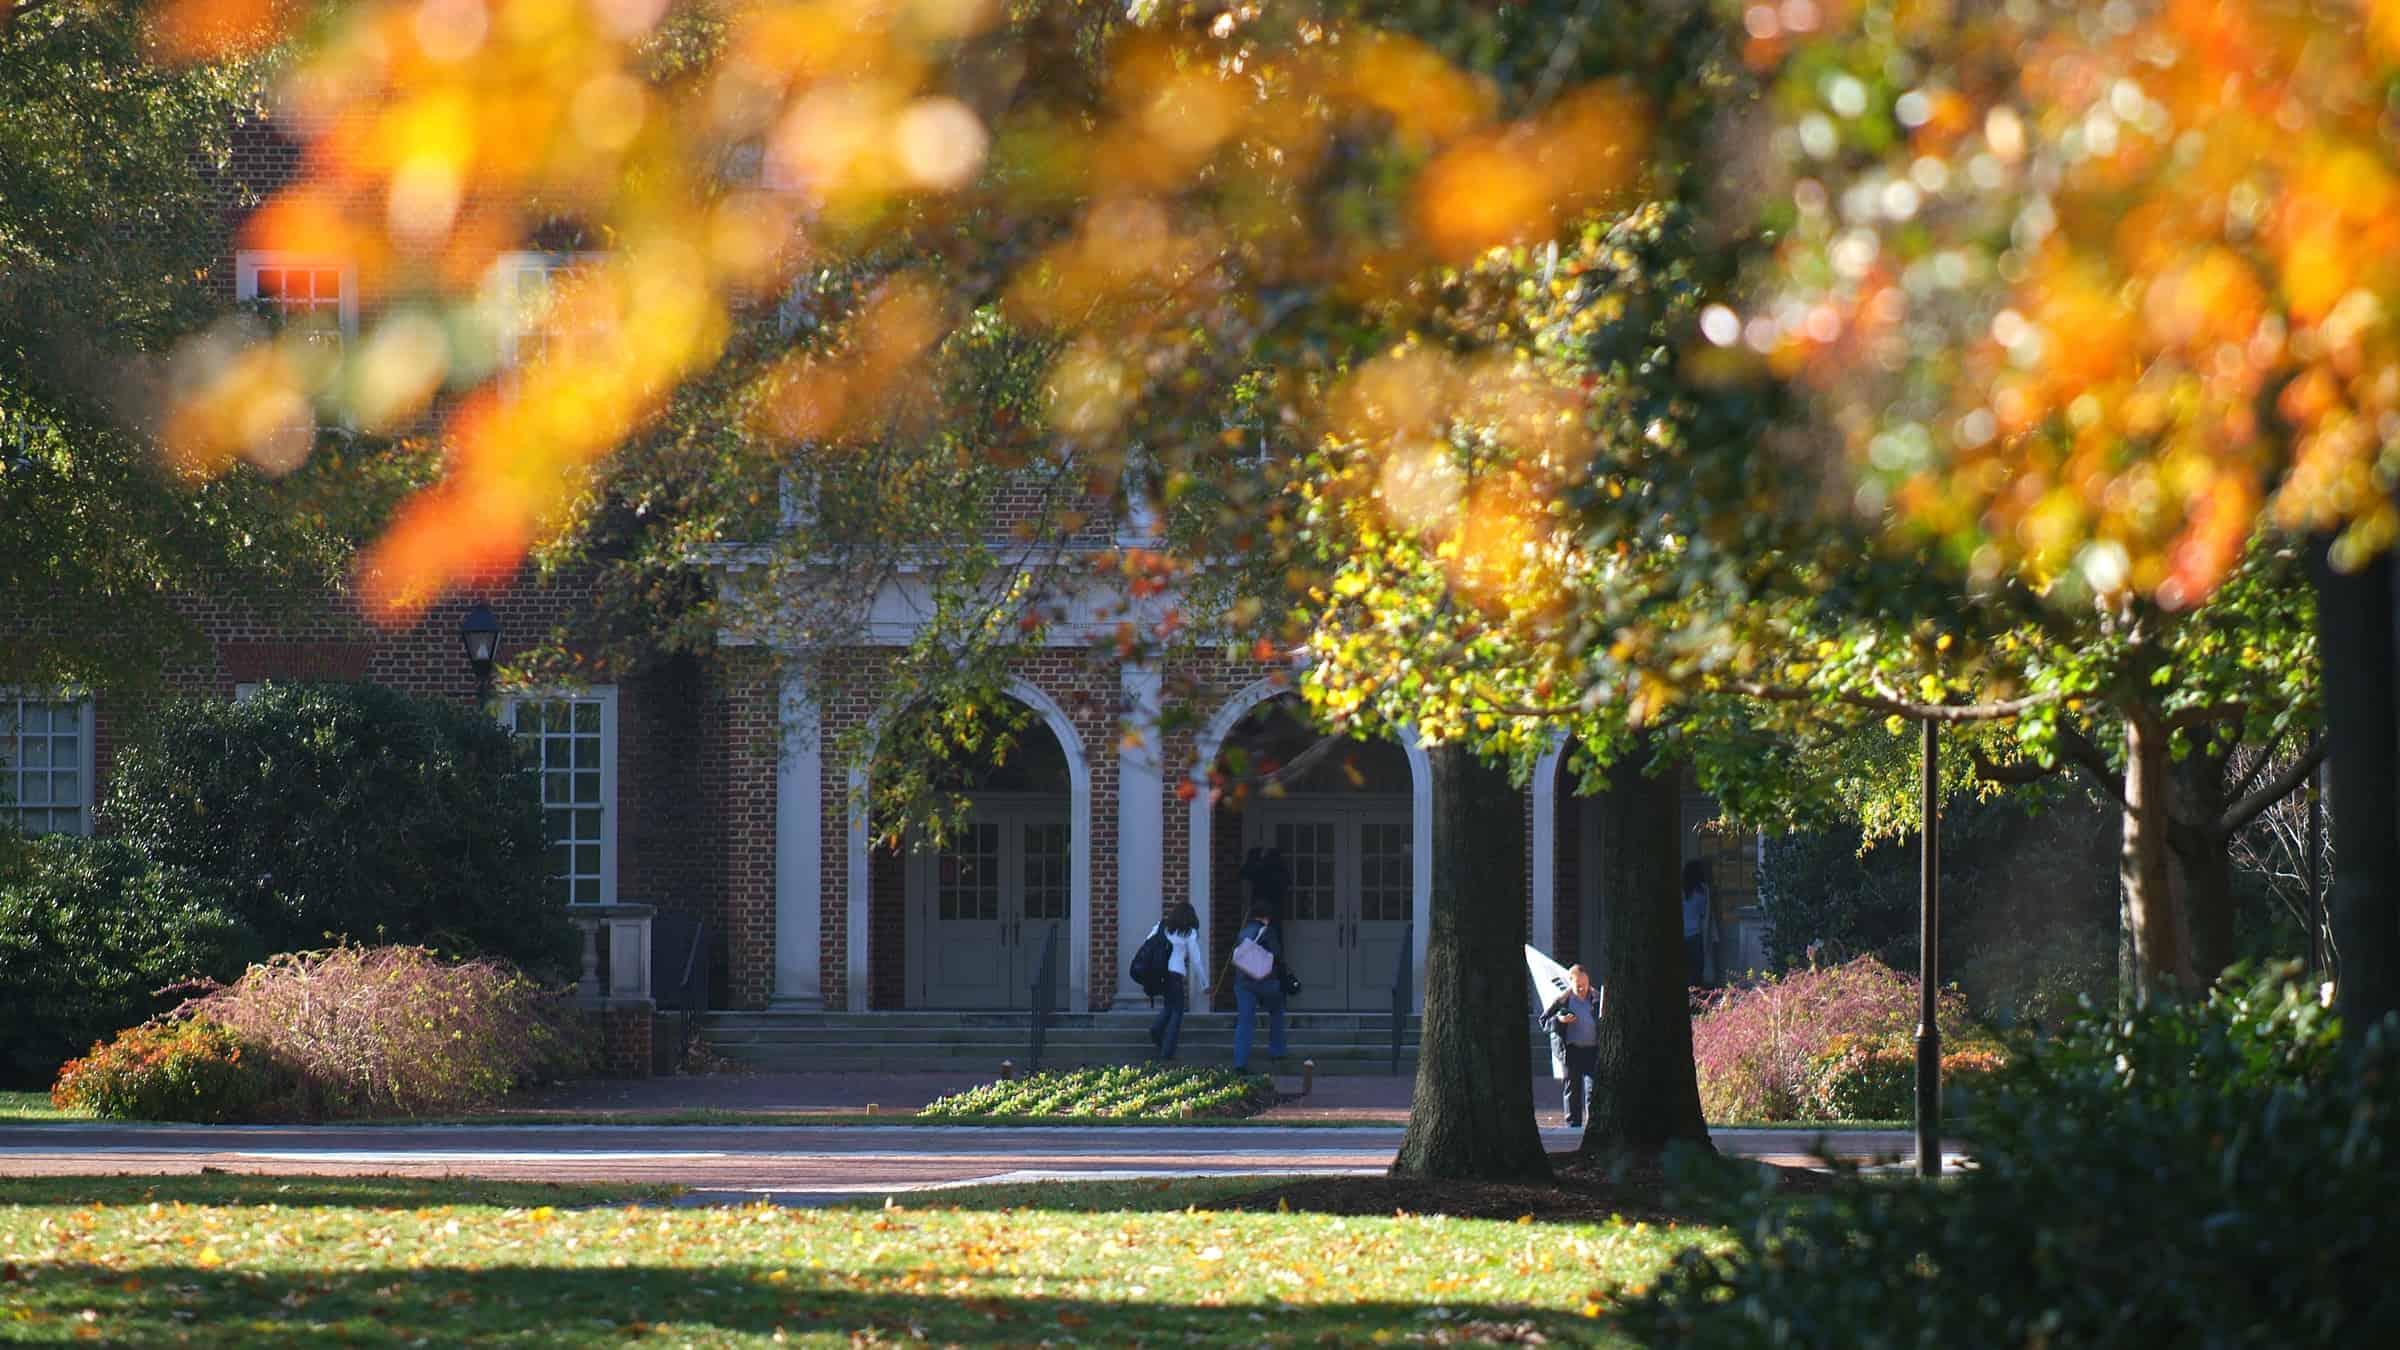 Regent University offers undergraduate and graduate degrees online and on-campus, Virginia Beach, VA 23464